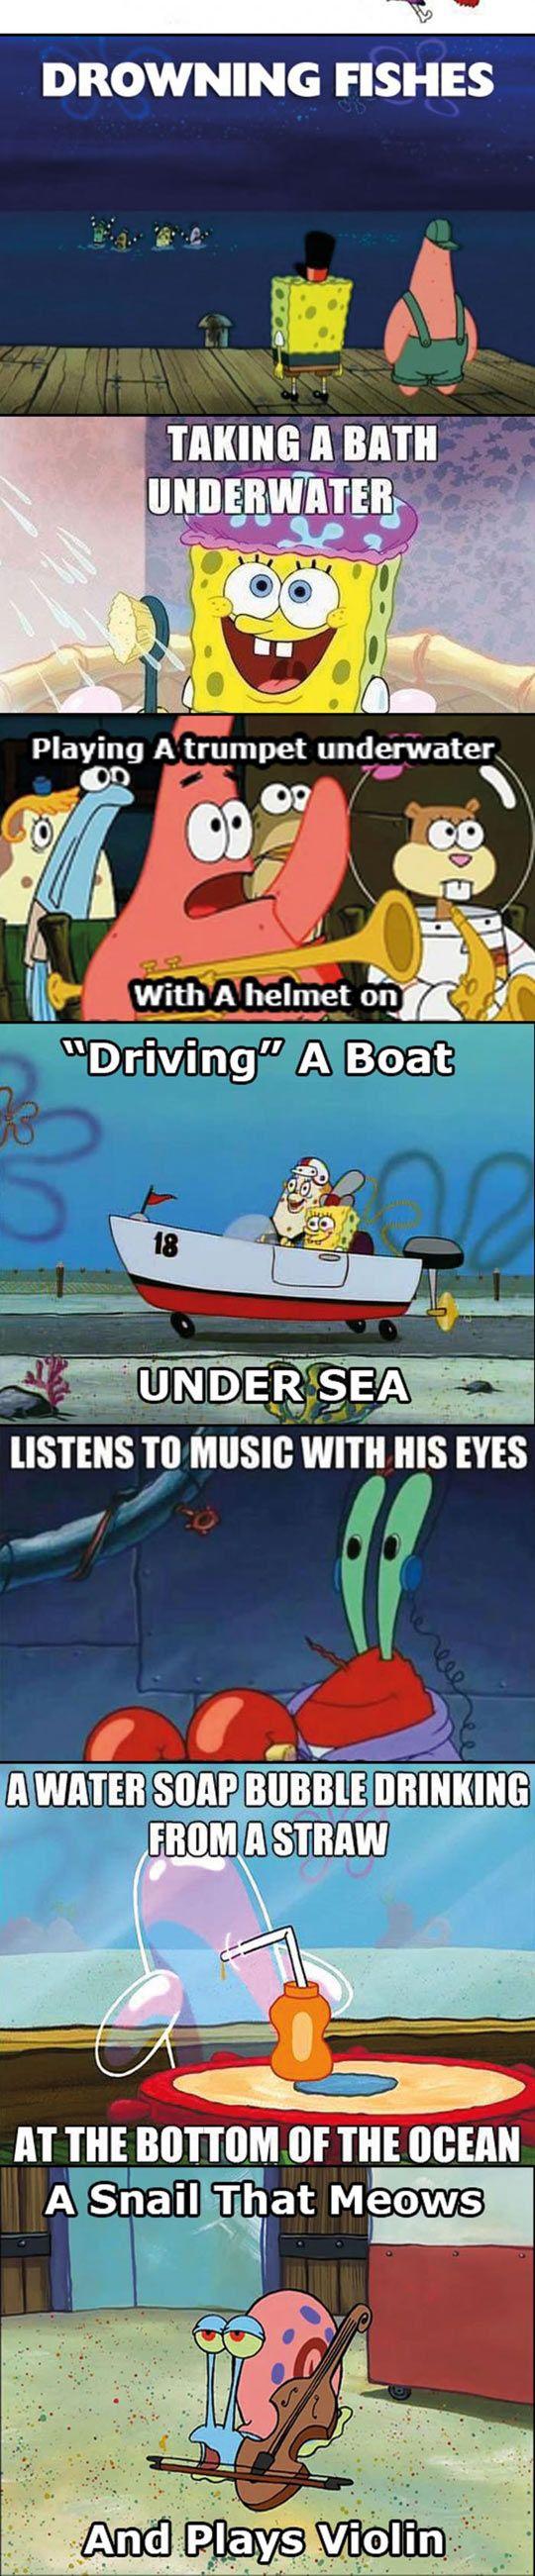 SpongeBob Logic<<< DID THEY JUST CALL A SAXOPHONE A TRUMPET??? CUZ THAT LOOKS LIKE A SAX NOT A TRUMPET!!!!!!!!